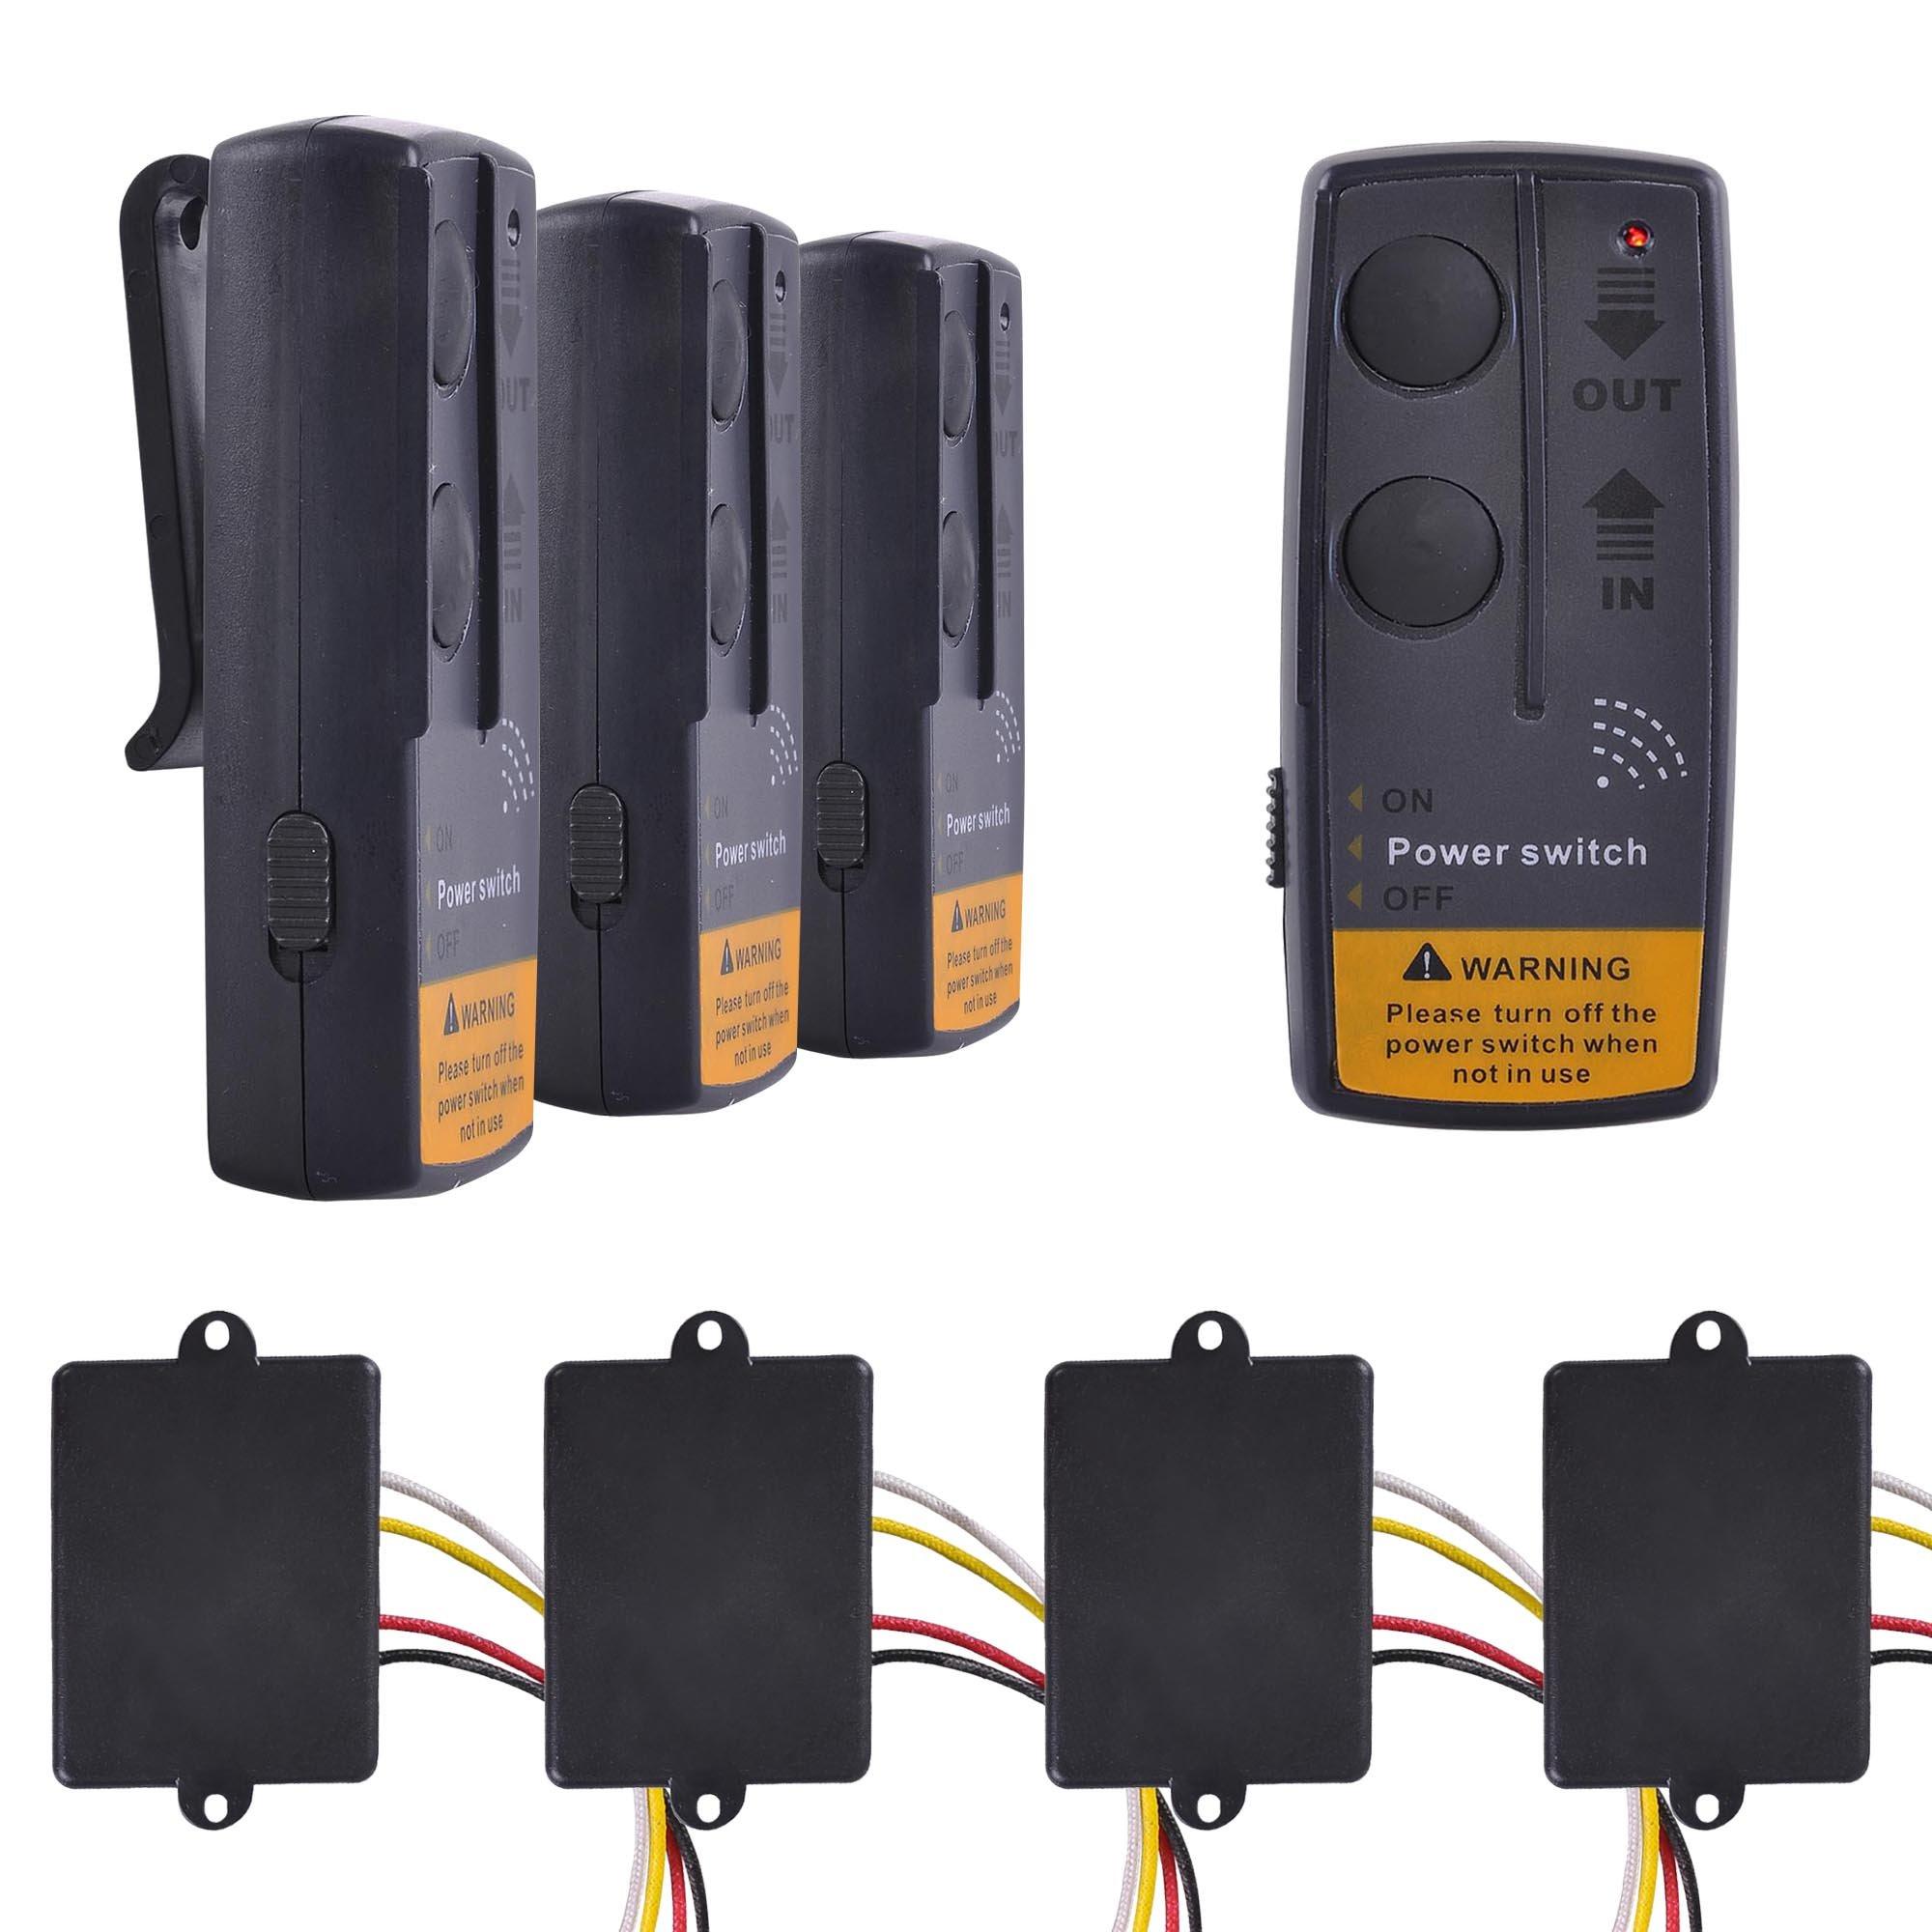 Yescom 65ft Wireless Winch Remote Control Kit for Jeep ATV SUV UTV 12V Switch Handset, 4 Pack by Yescom